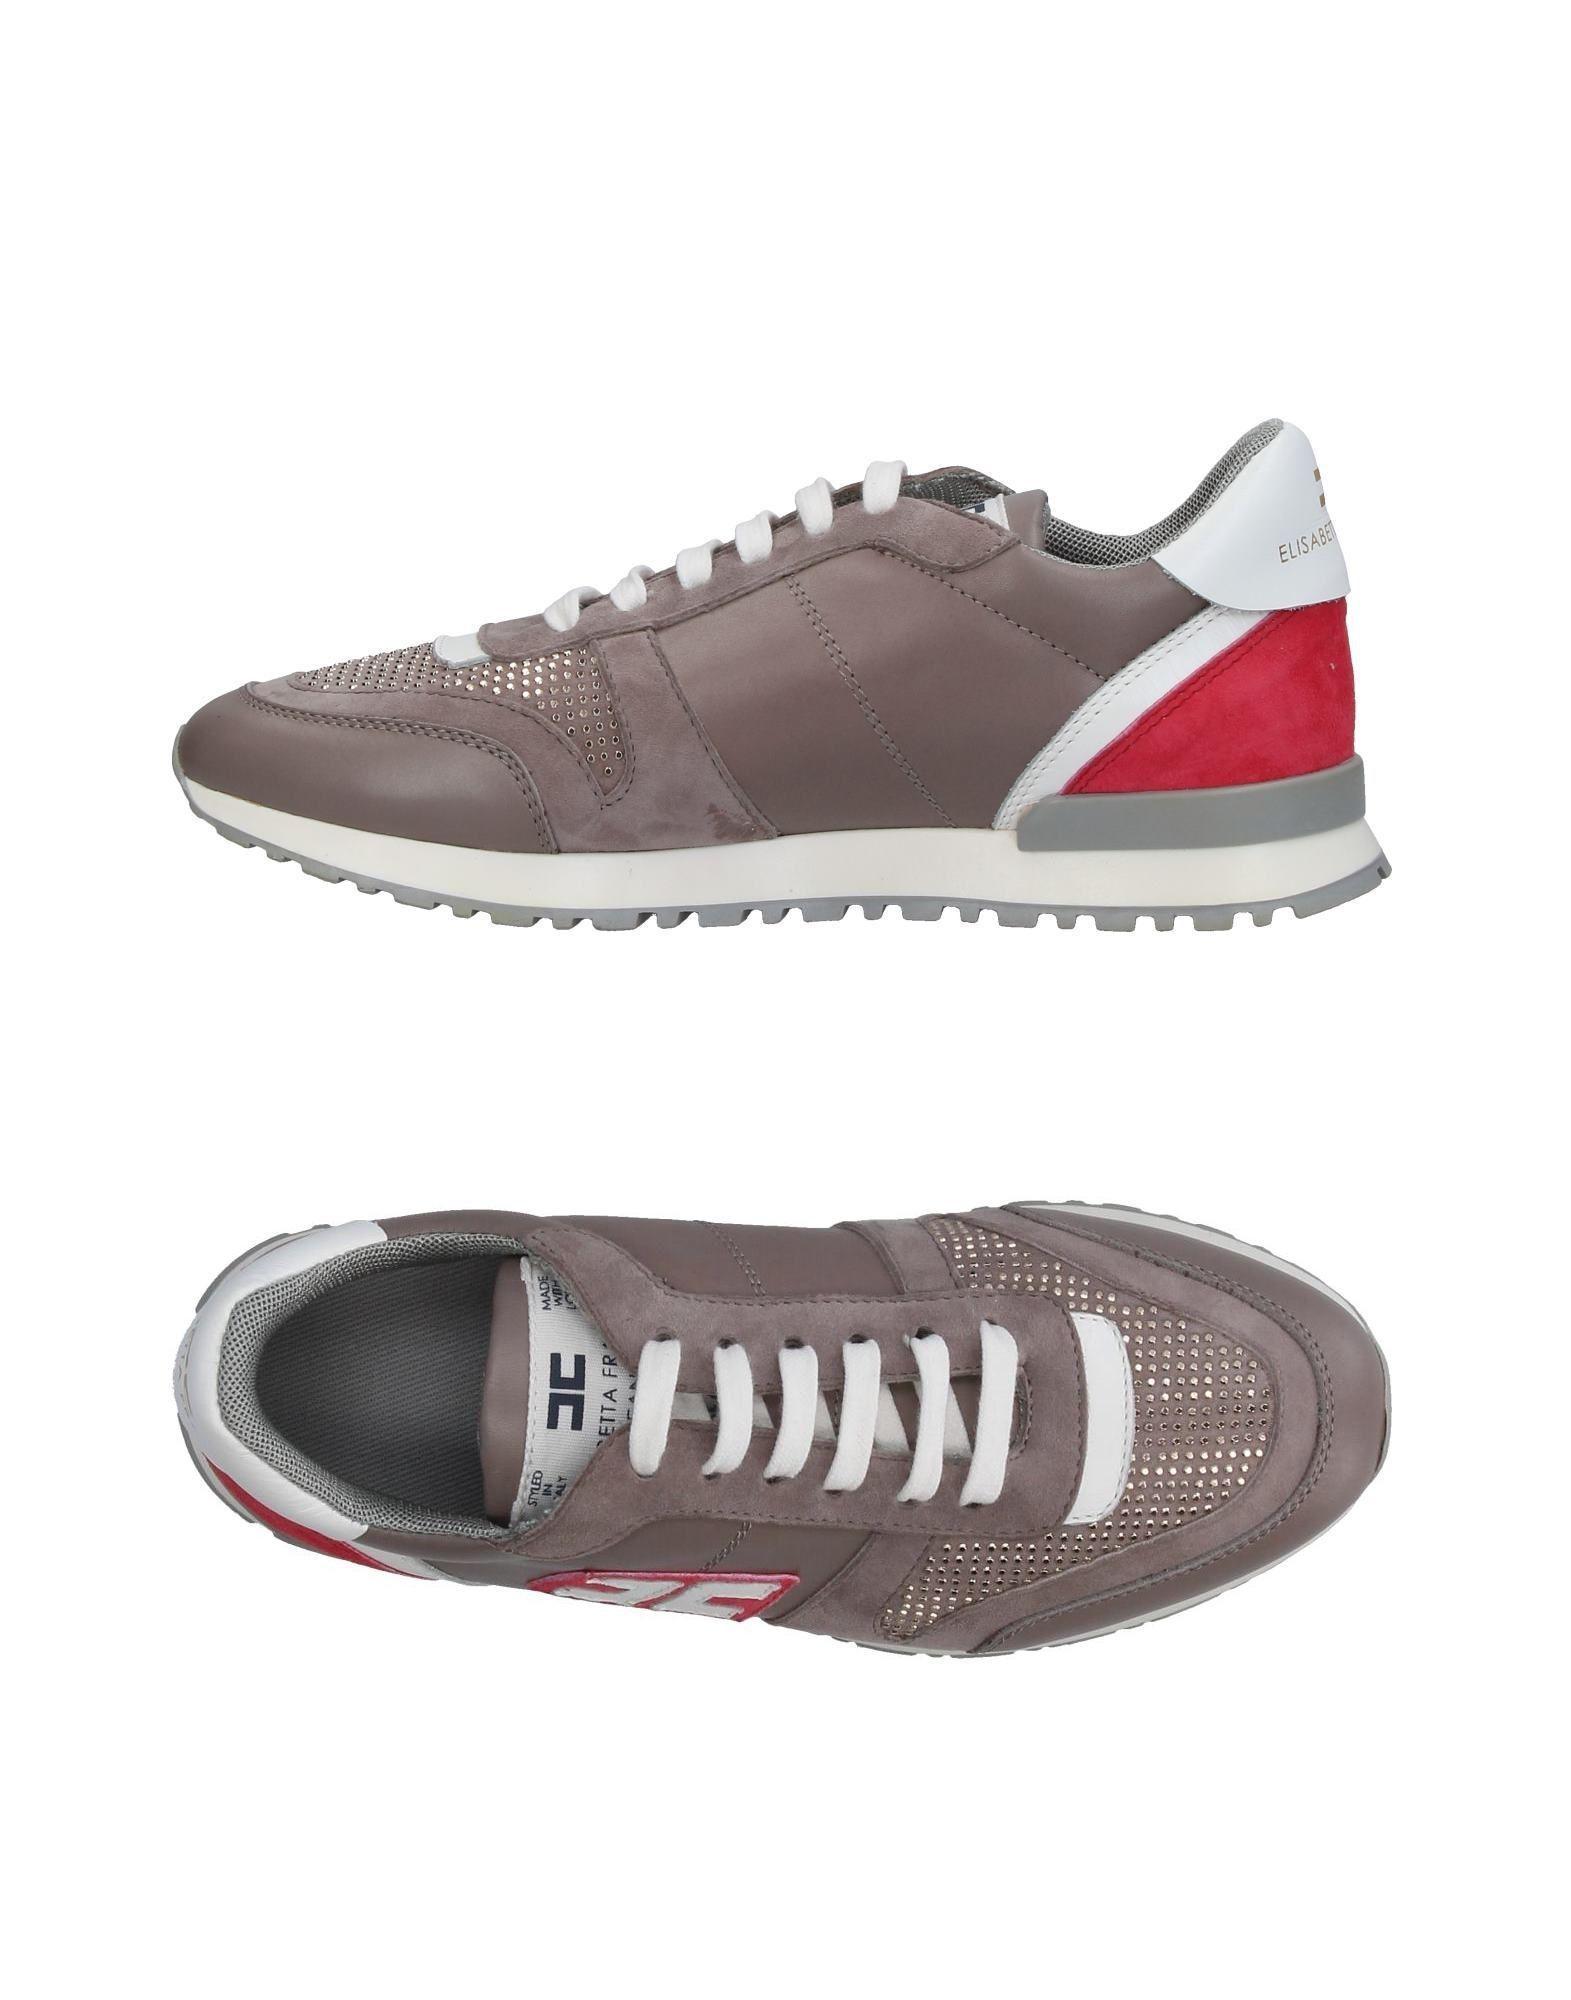 Elisabetta Franchi Bas-tops Et Chaussures De Sport HhqsyXUf